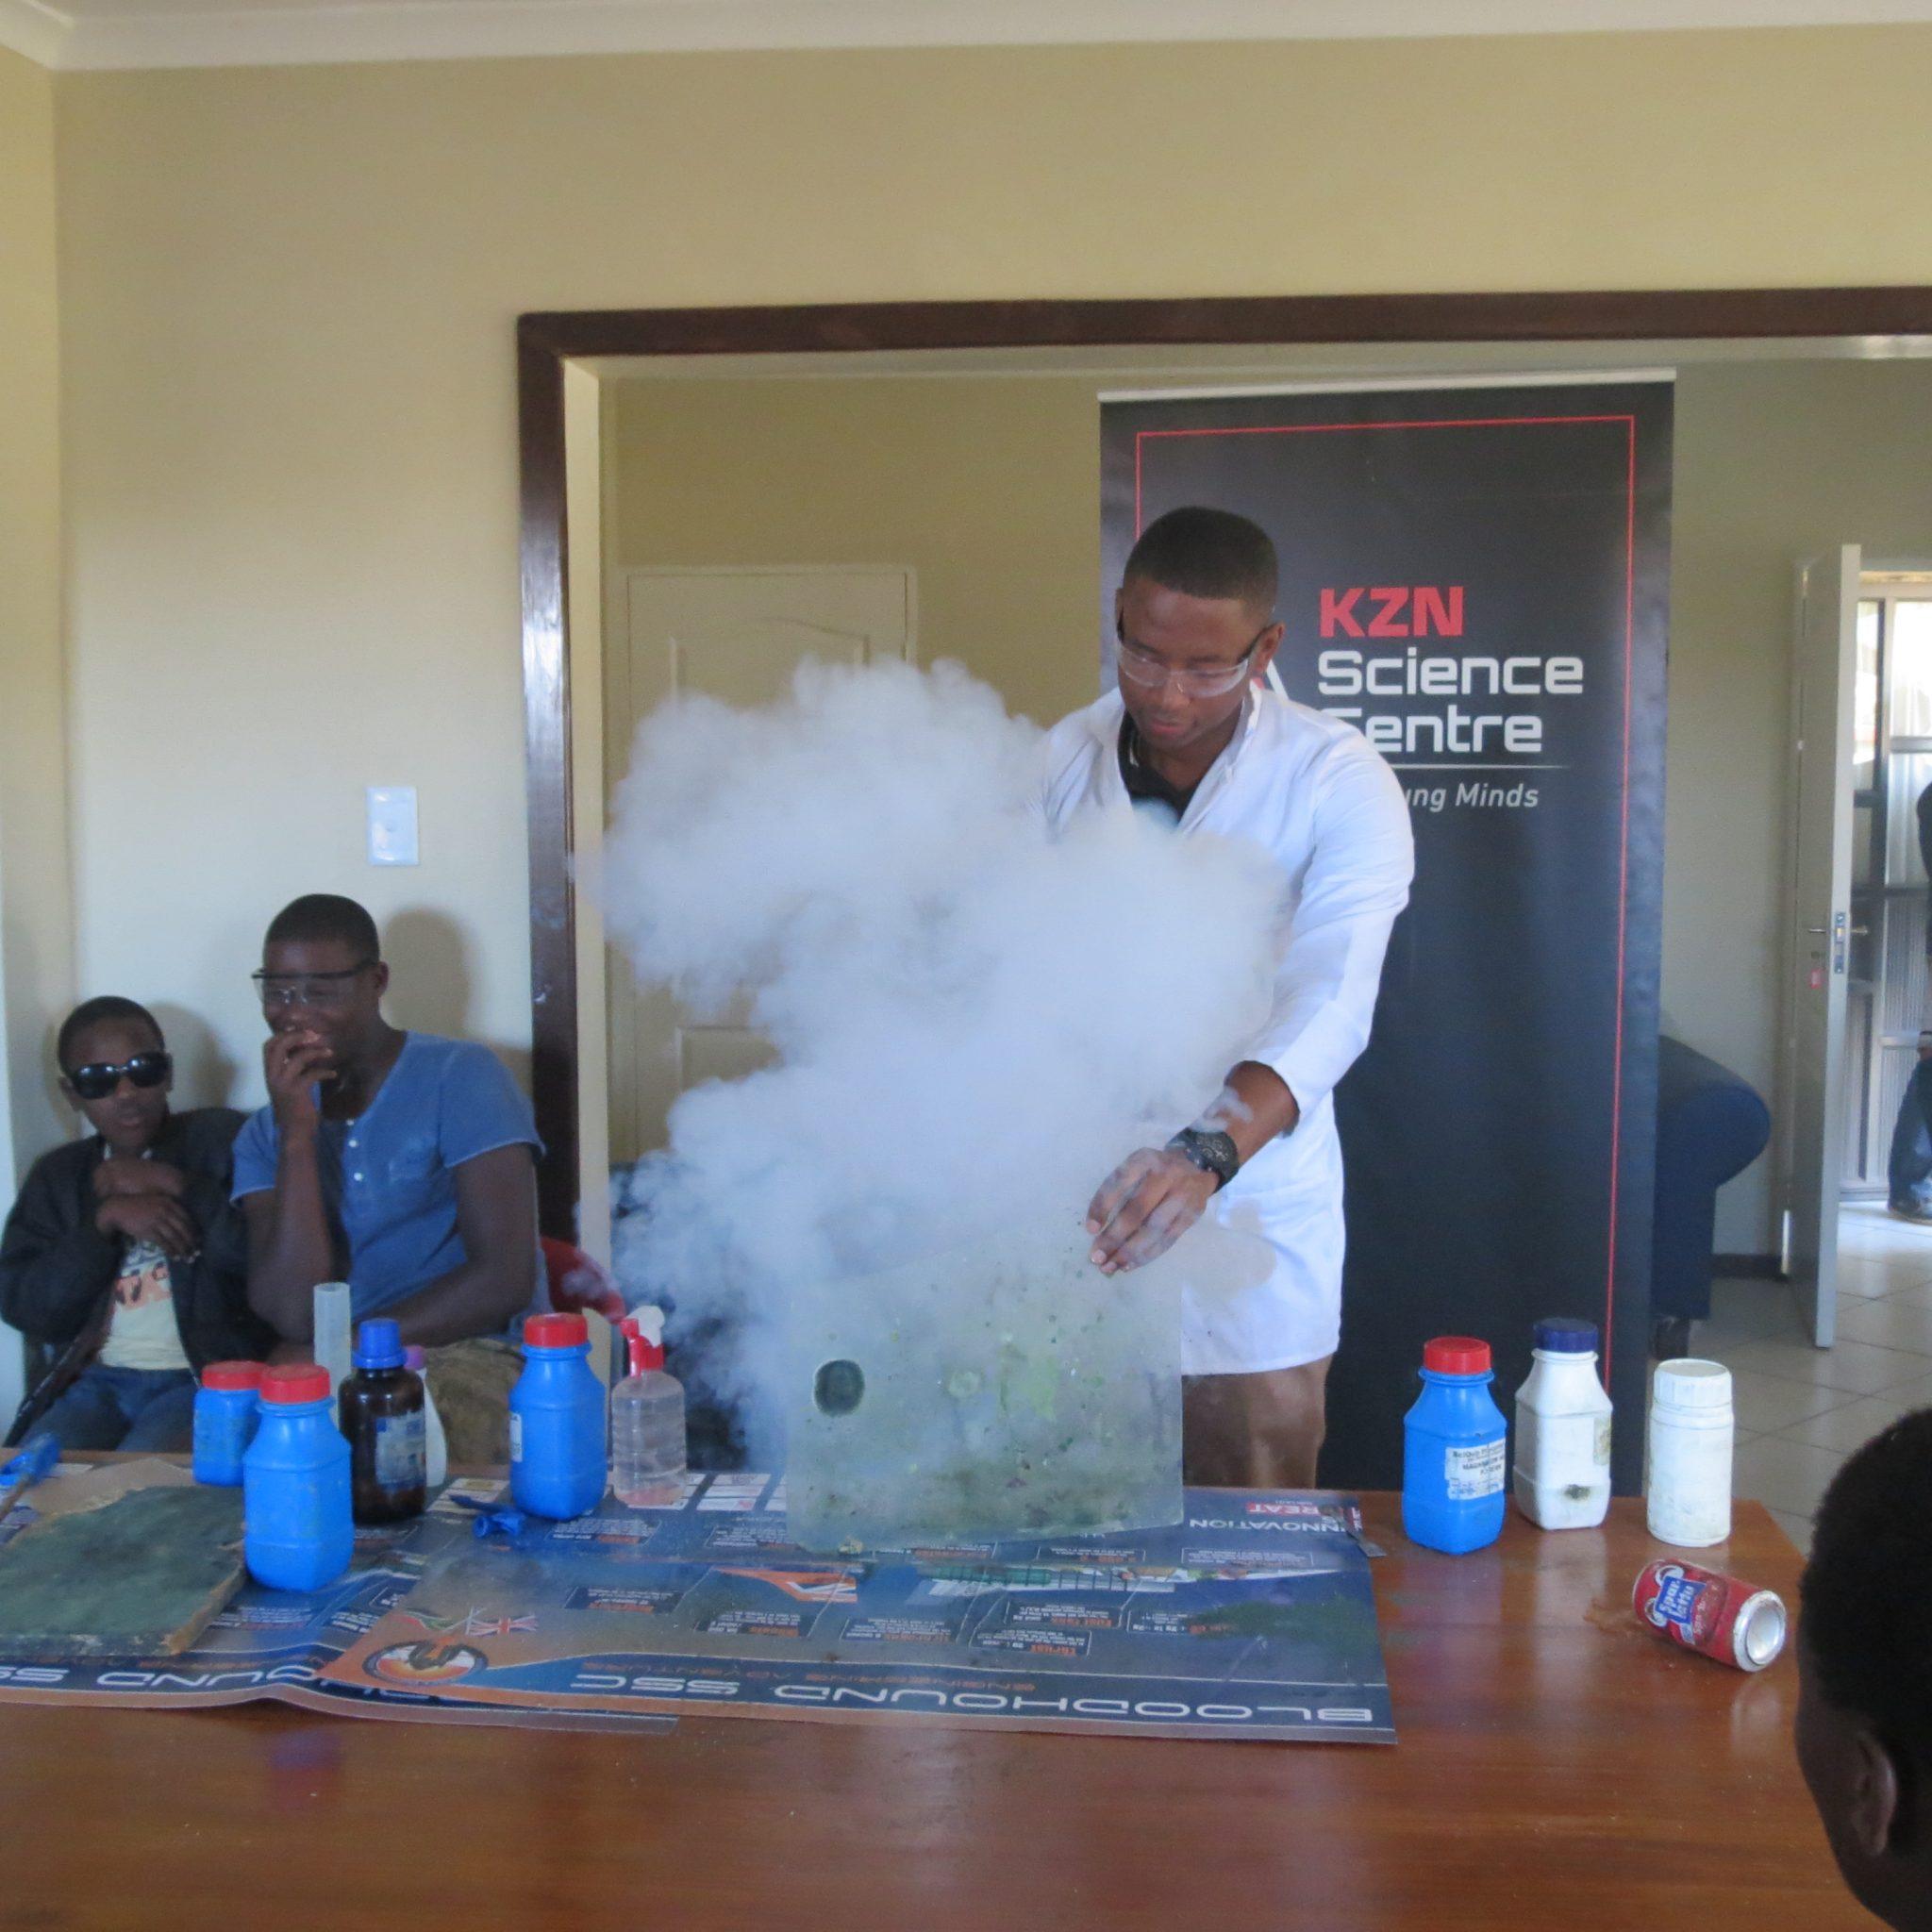 Must see Abalindi Children'S Home - Luyanda-Mlambo-a-KZN-Science-Centre-education-officer-entertaining-the-youth-at-the-Abalindi-Childrens-Home-recently  Image_163735.jpg?resize\u003d1280%2C640\u0026ssl\u003d1